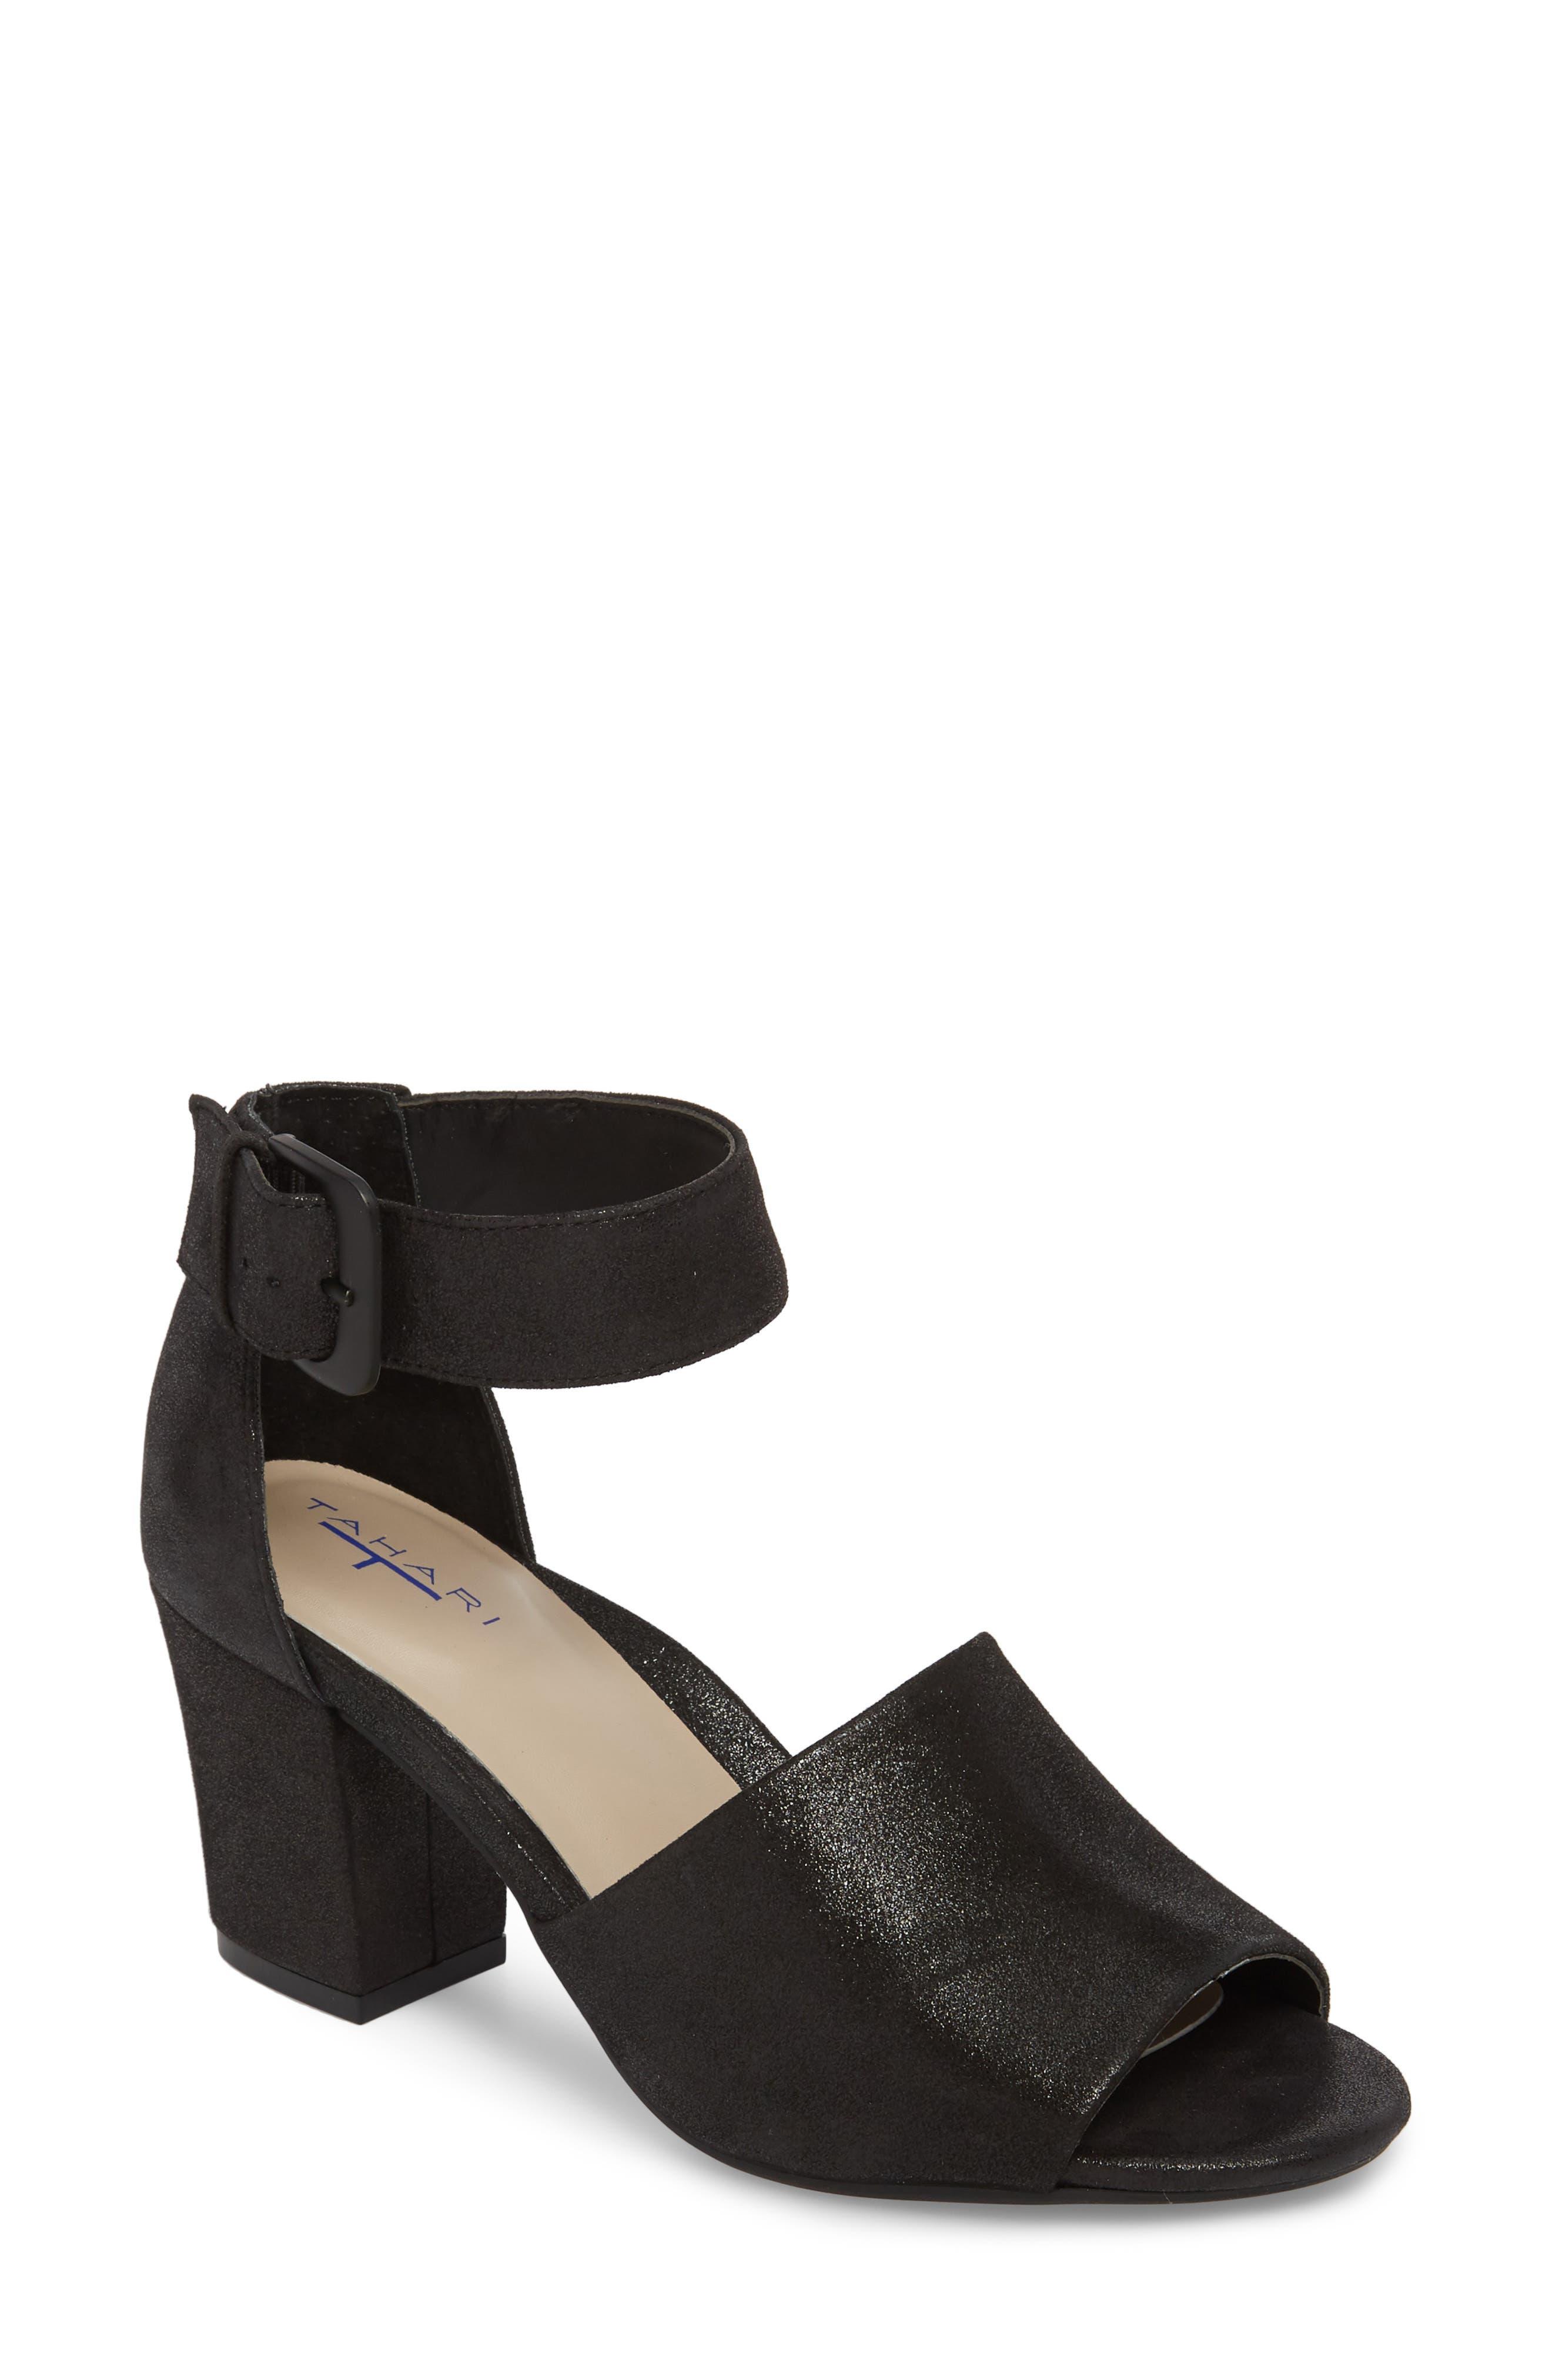 Piper Sandal,                             Main thumbnail 1, color,                             BLACK SUEDE